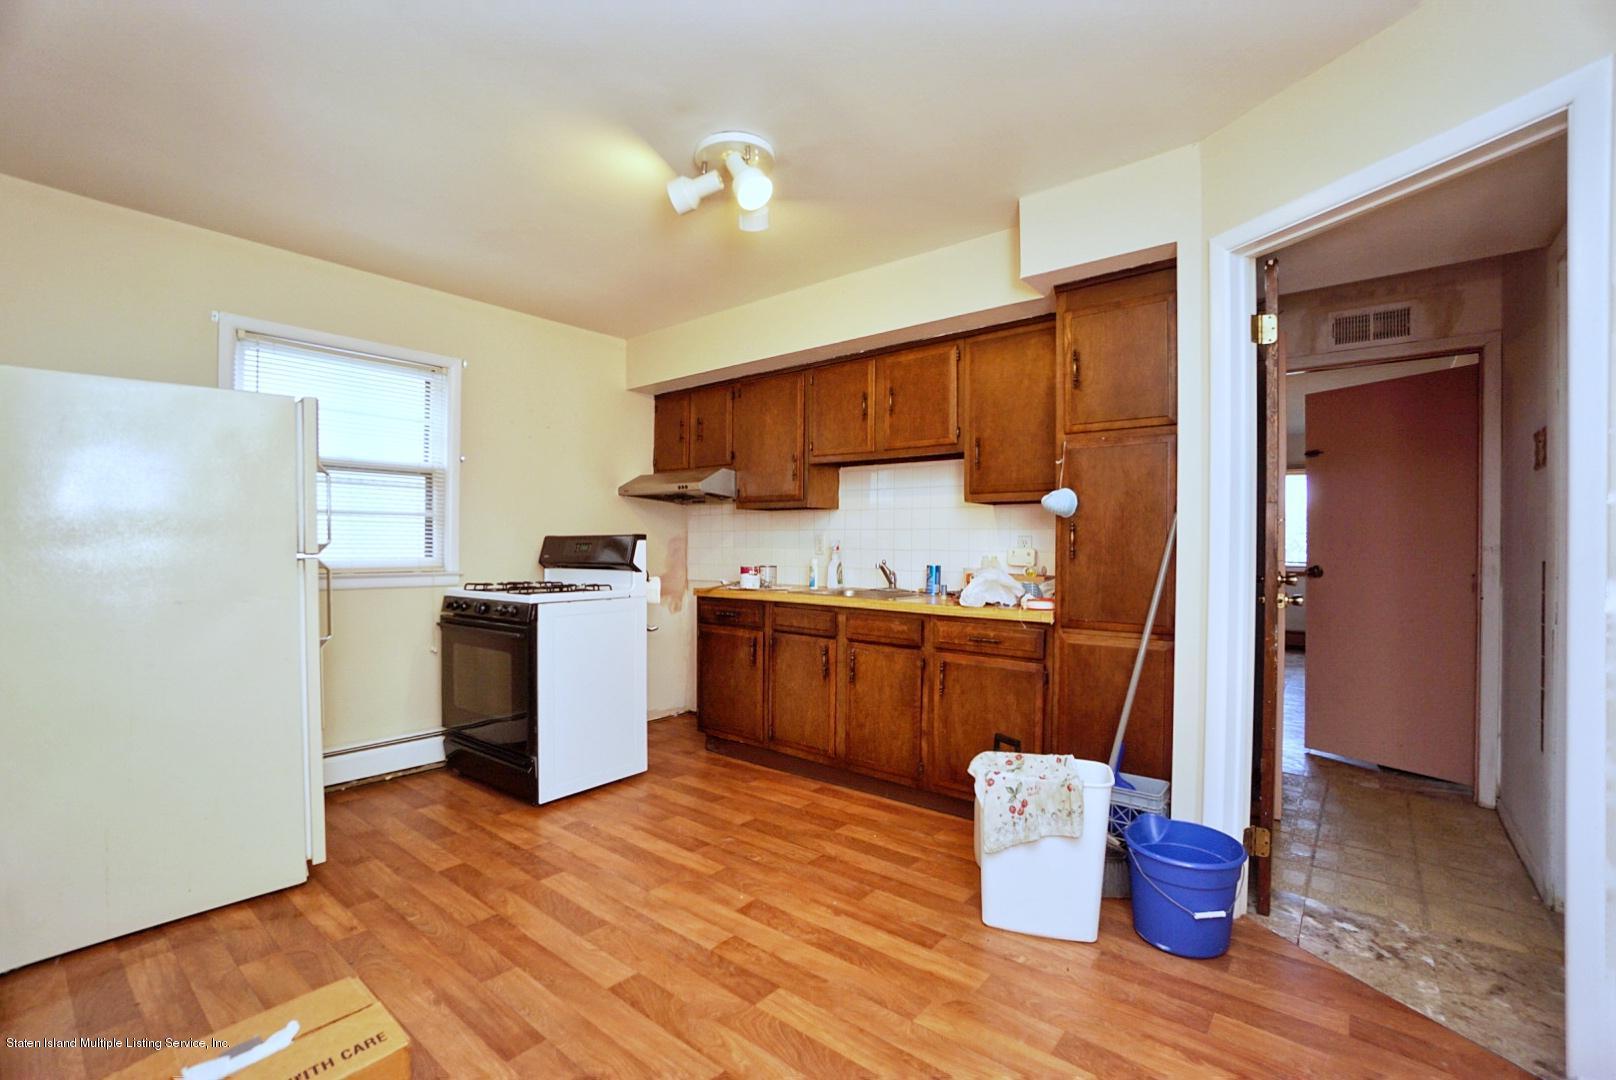 Single Family - Detached 495 Winchester Avenue  Staten Island, NY 10312, MLS-1136561-34